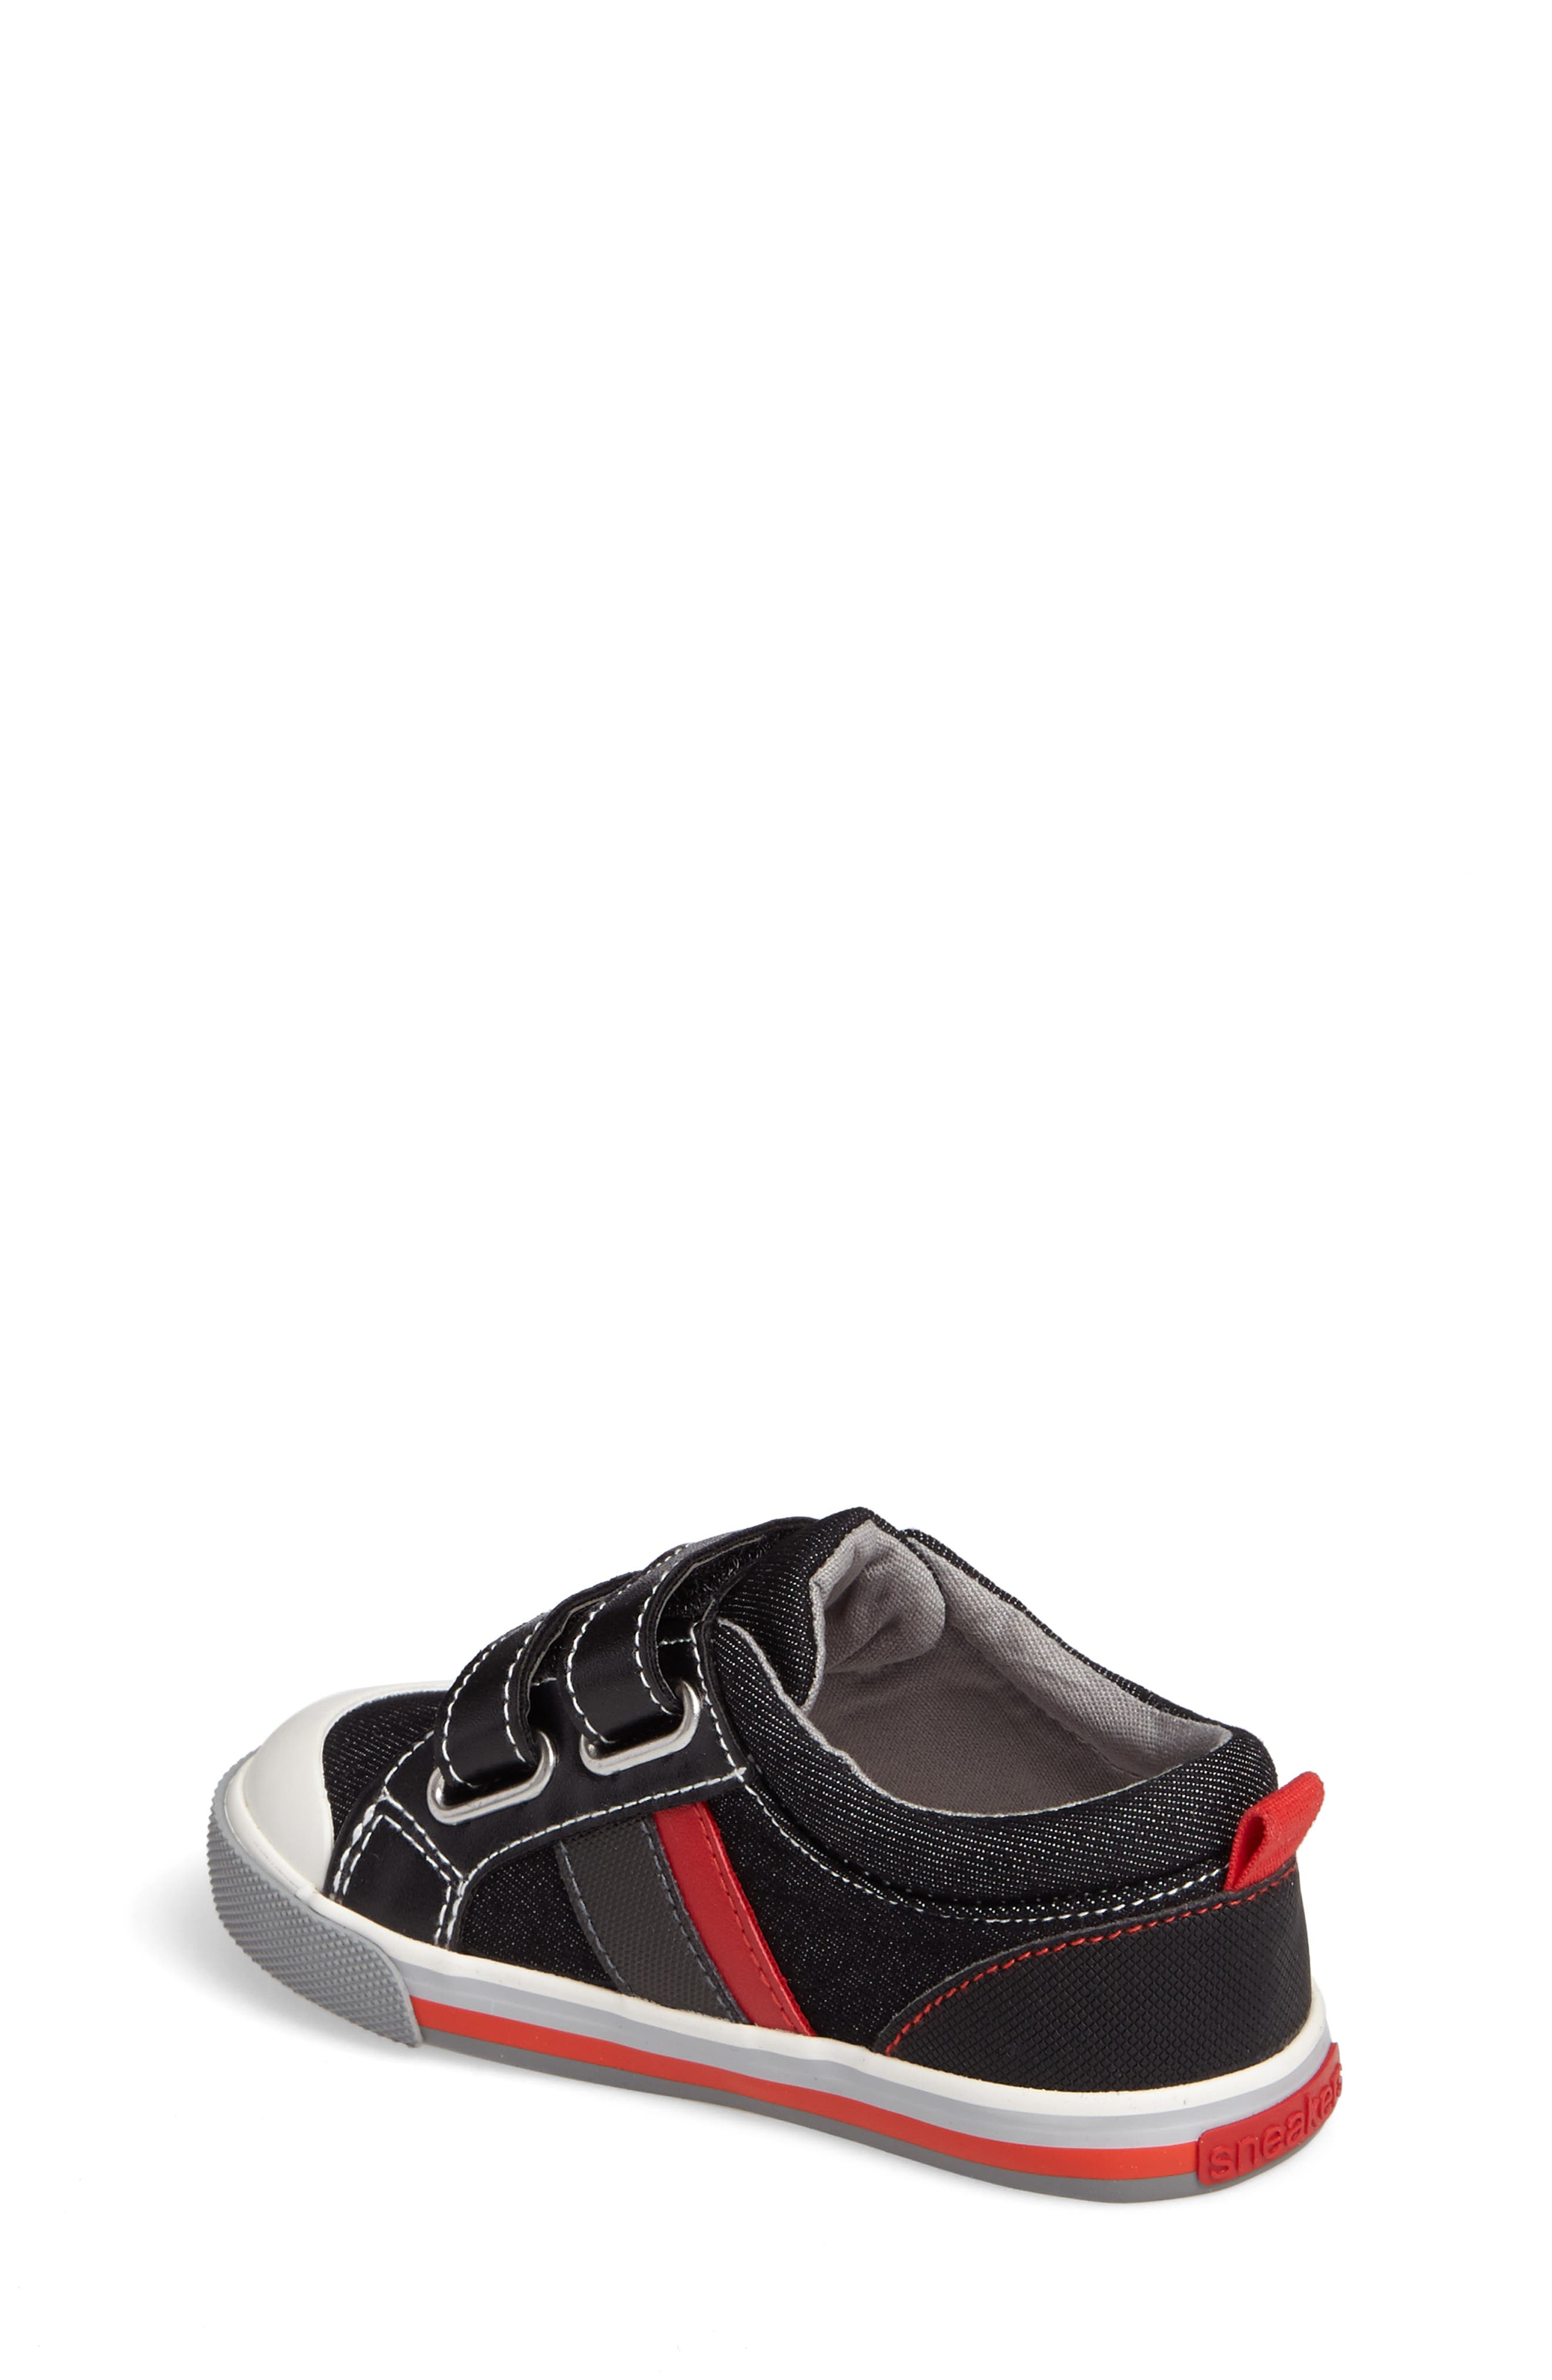 'Russell' Sneaker,                             Alternate thumbnail 2, color,                             003